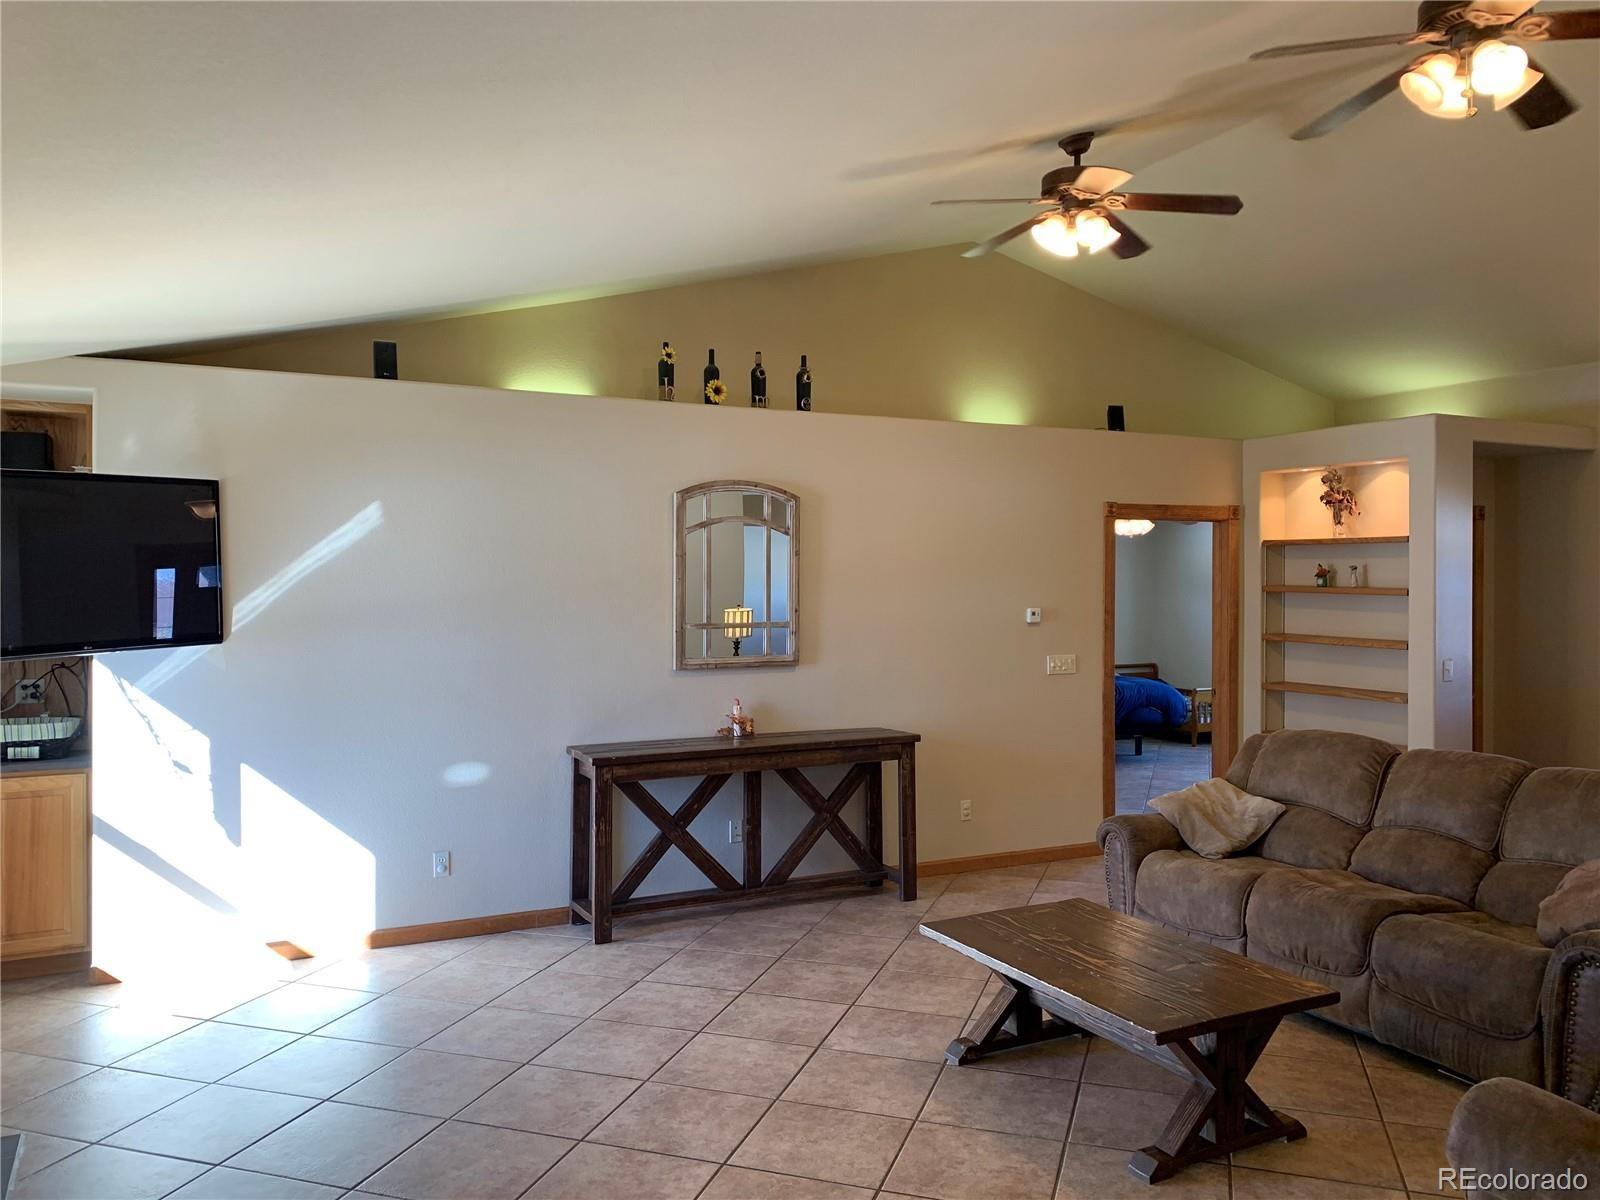 MLS# 7097007 - 9 - 27635 Rancho Sawatch , Buena Vista, CO 81211